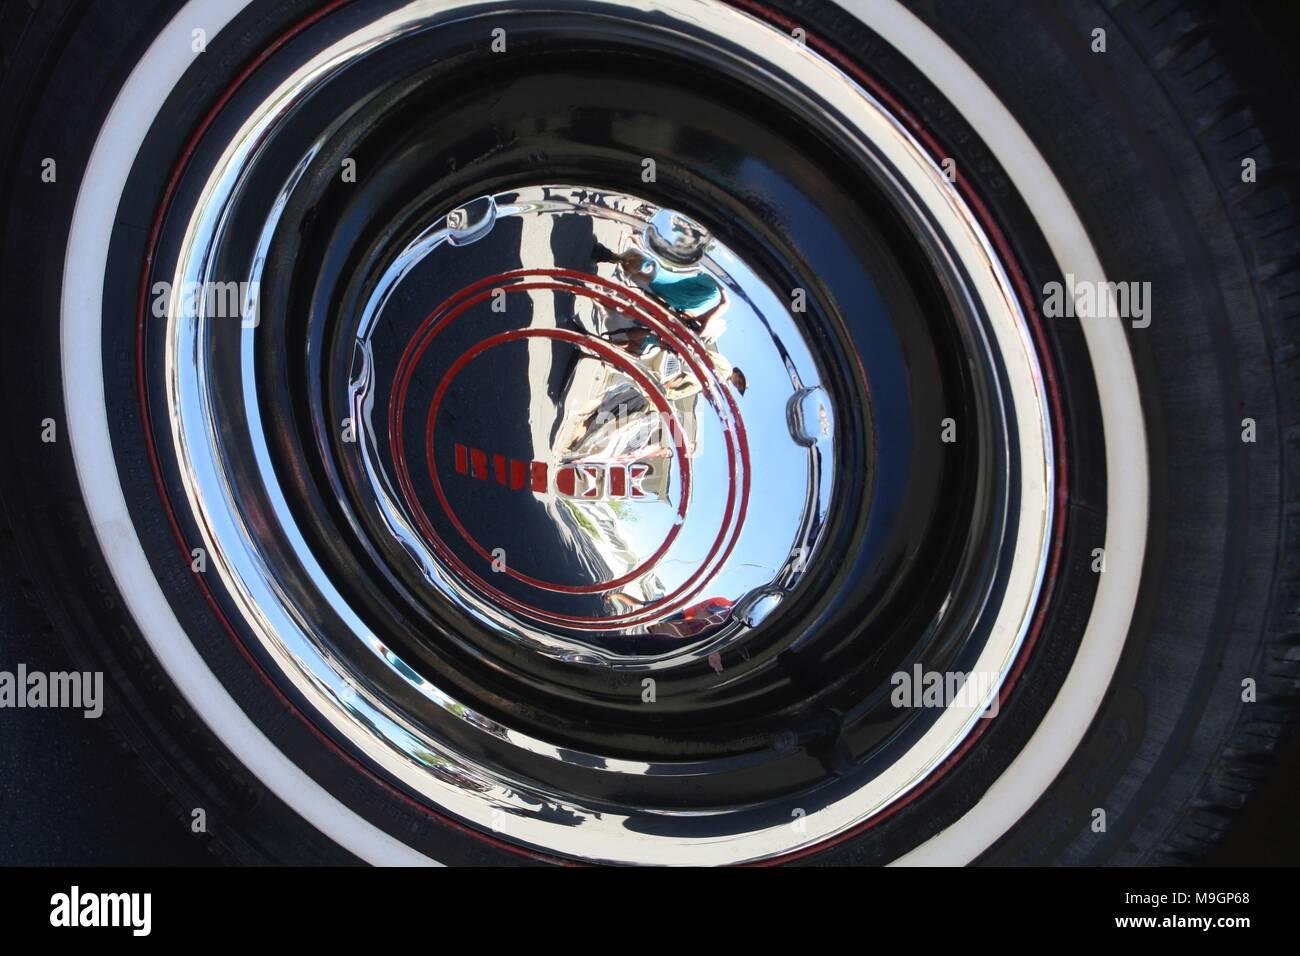 Classic Buick Stockfotos & Classic Buick Bilder - Alamy